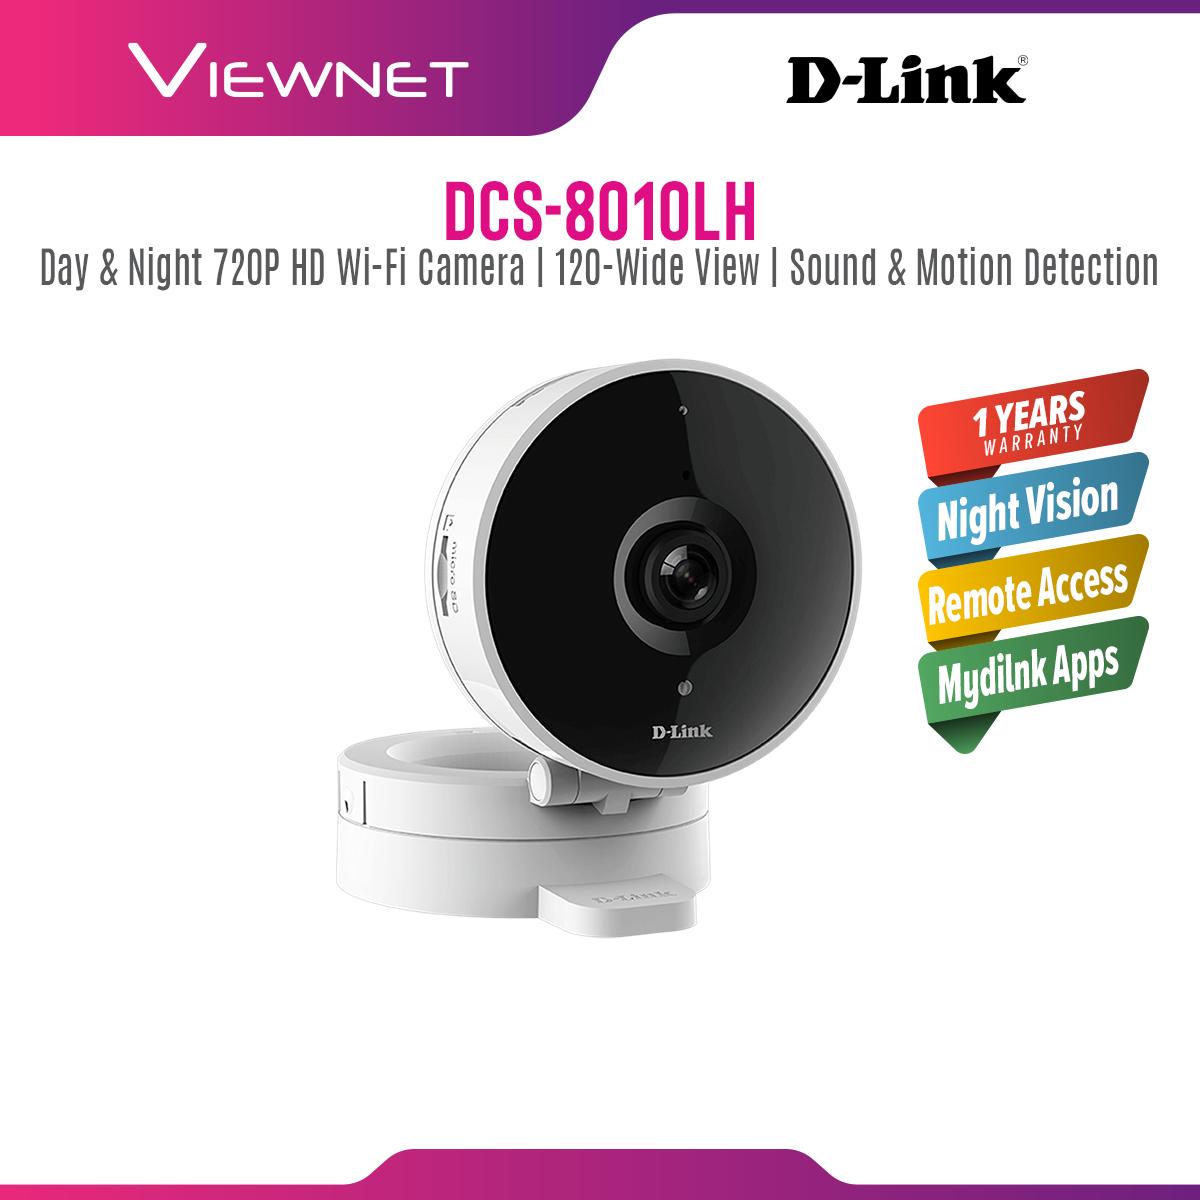 D-Link DCS-8010LH HD Wi-Fi Smart Home Cloud Camera